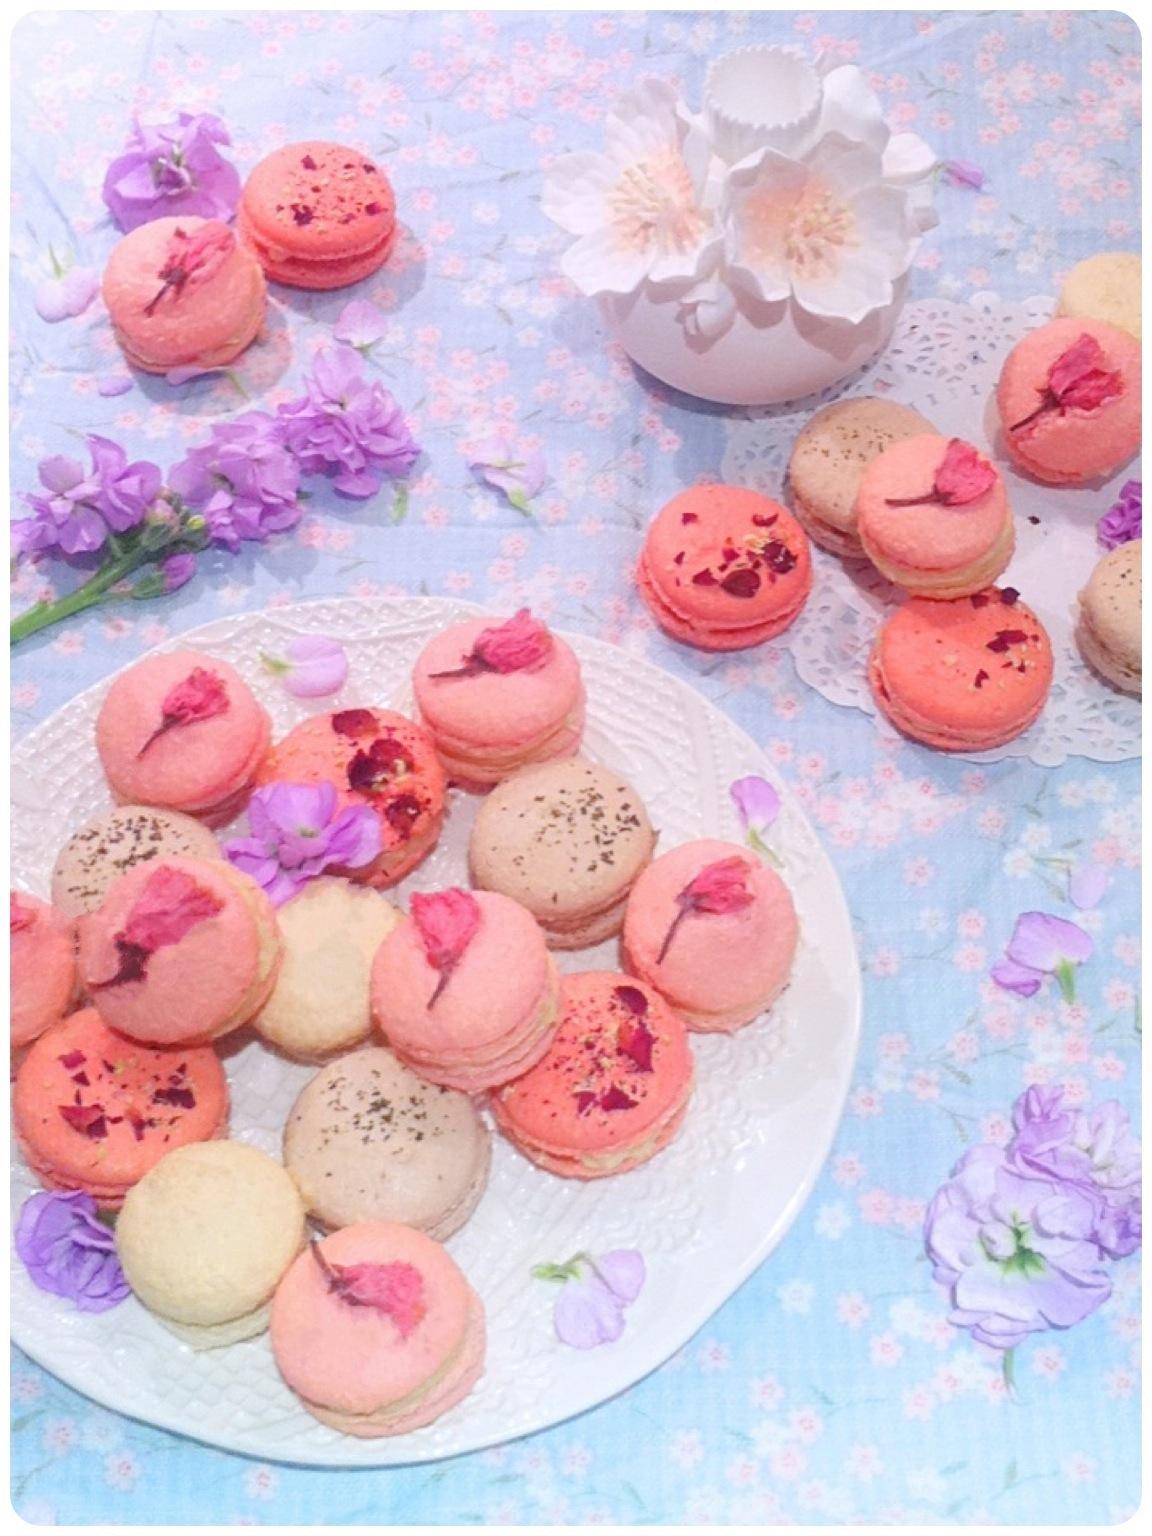 Cherry Blossom, Rose, Jasmine & Earl Grey Macarons Cherie Kelly Cake London